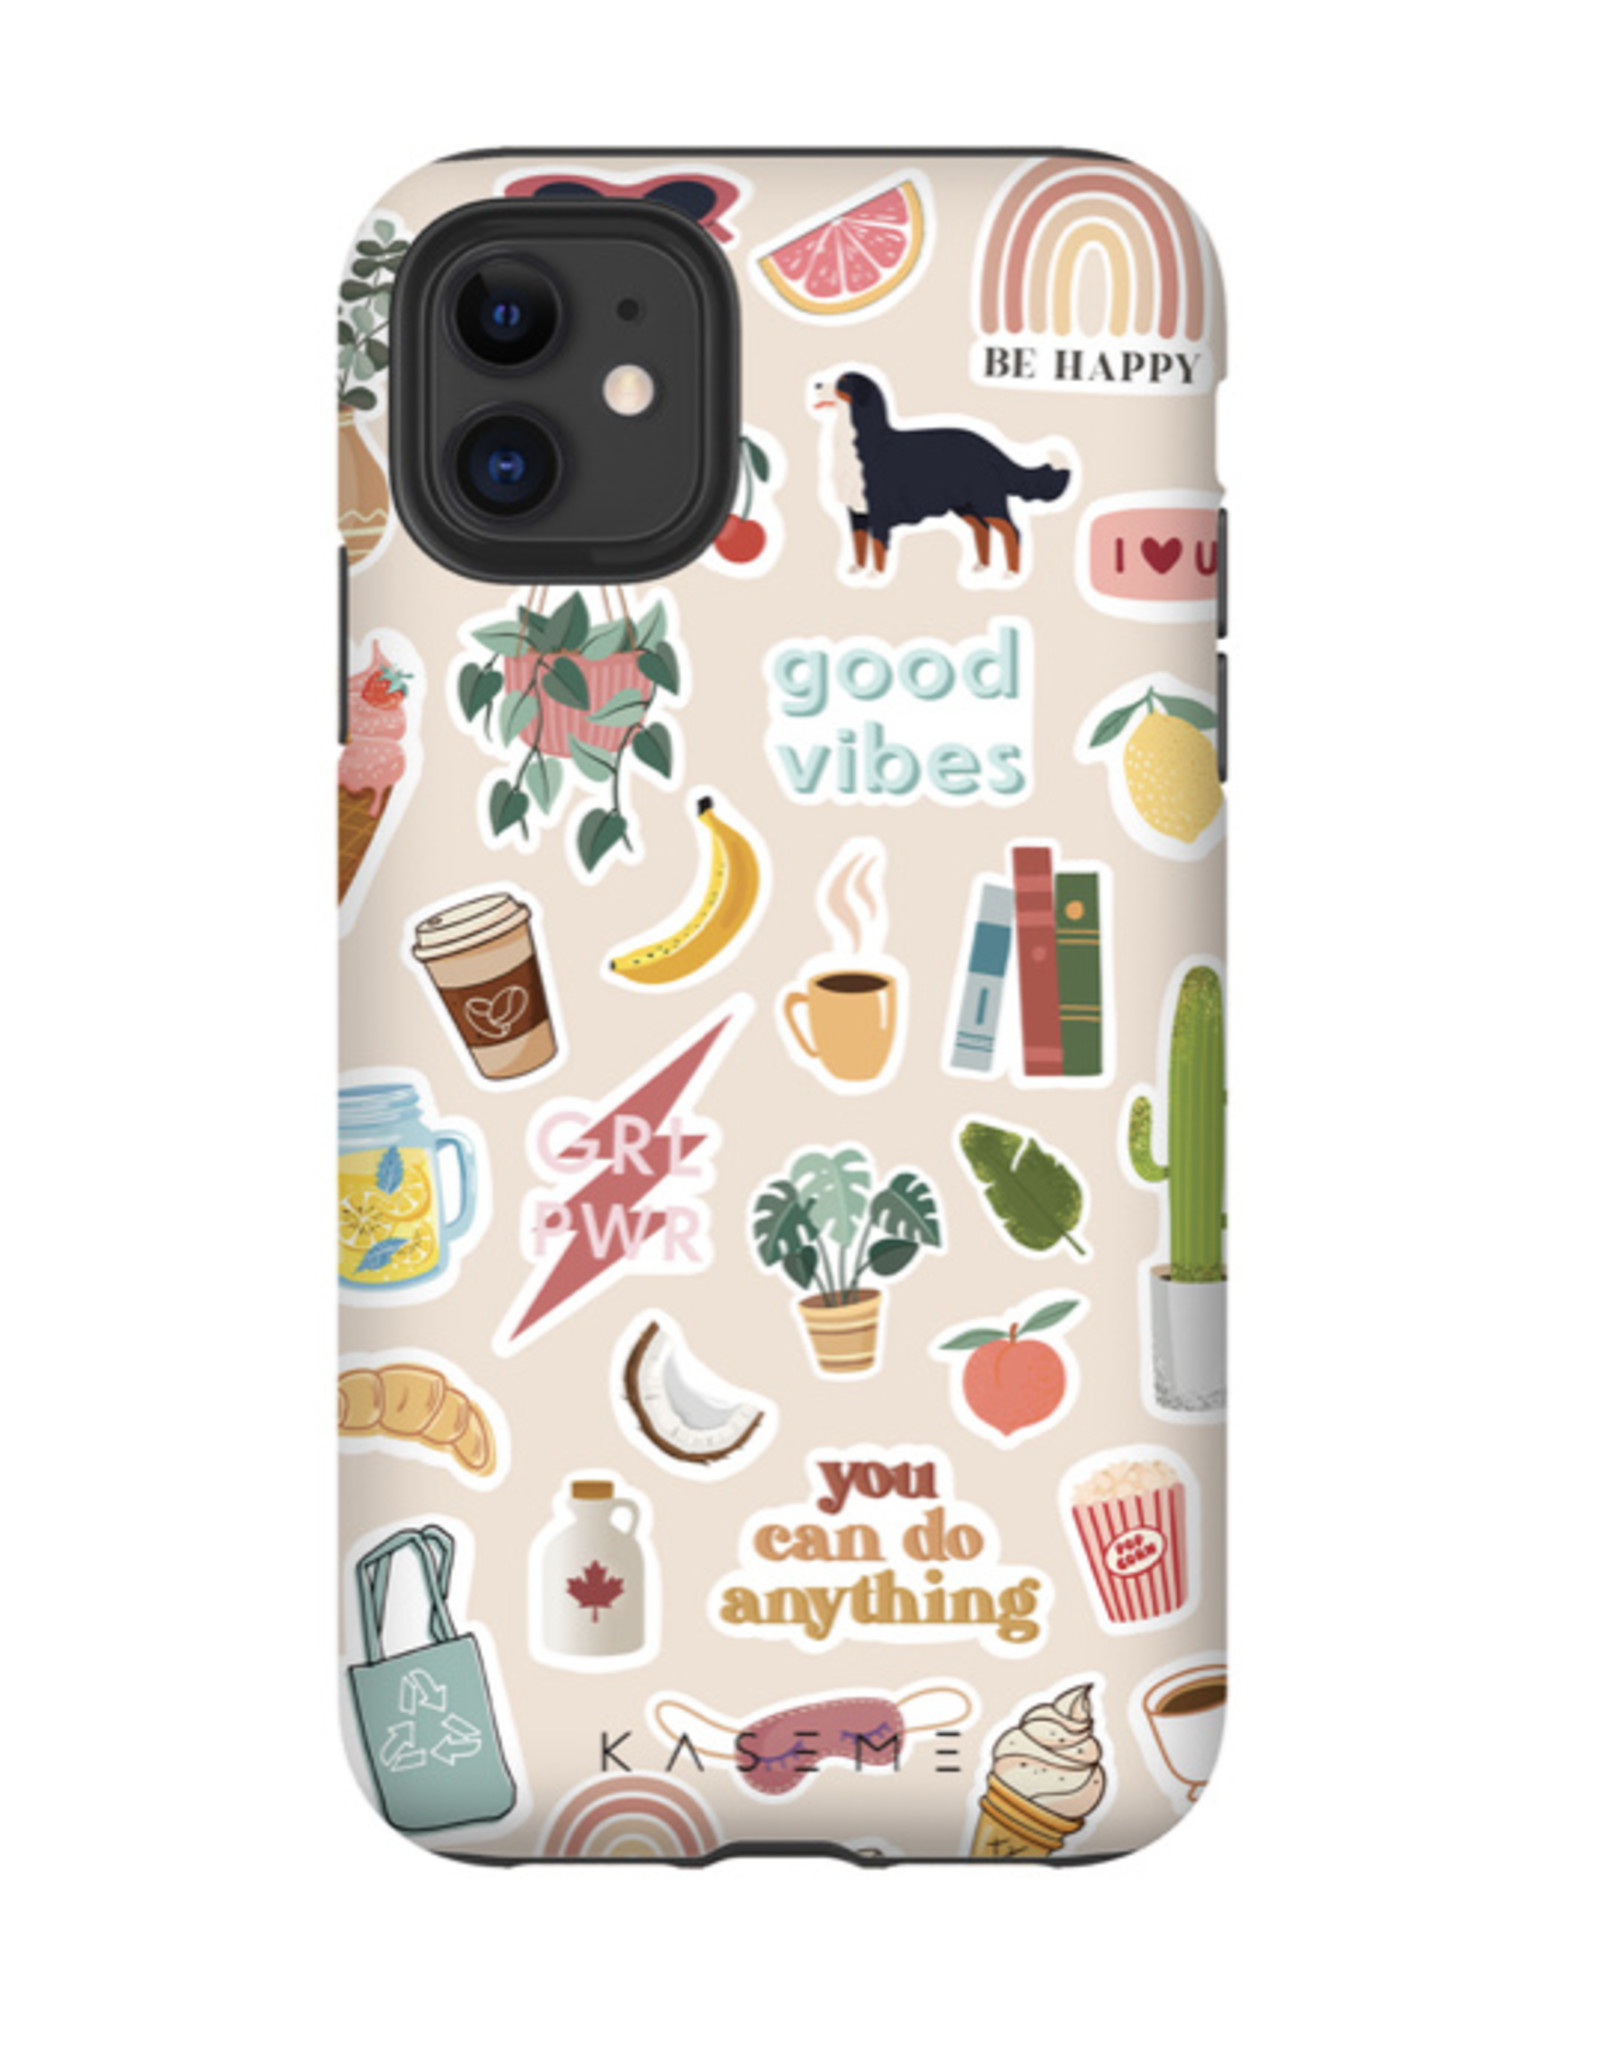 KaseMe Good Vibes, IPhone 11/XR Tough